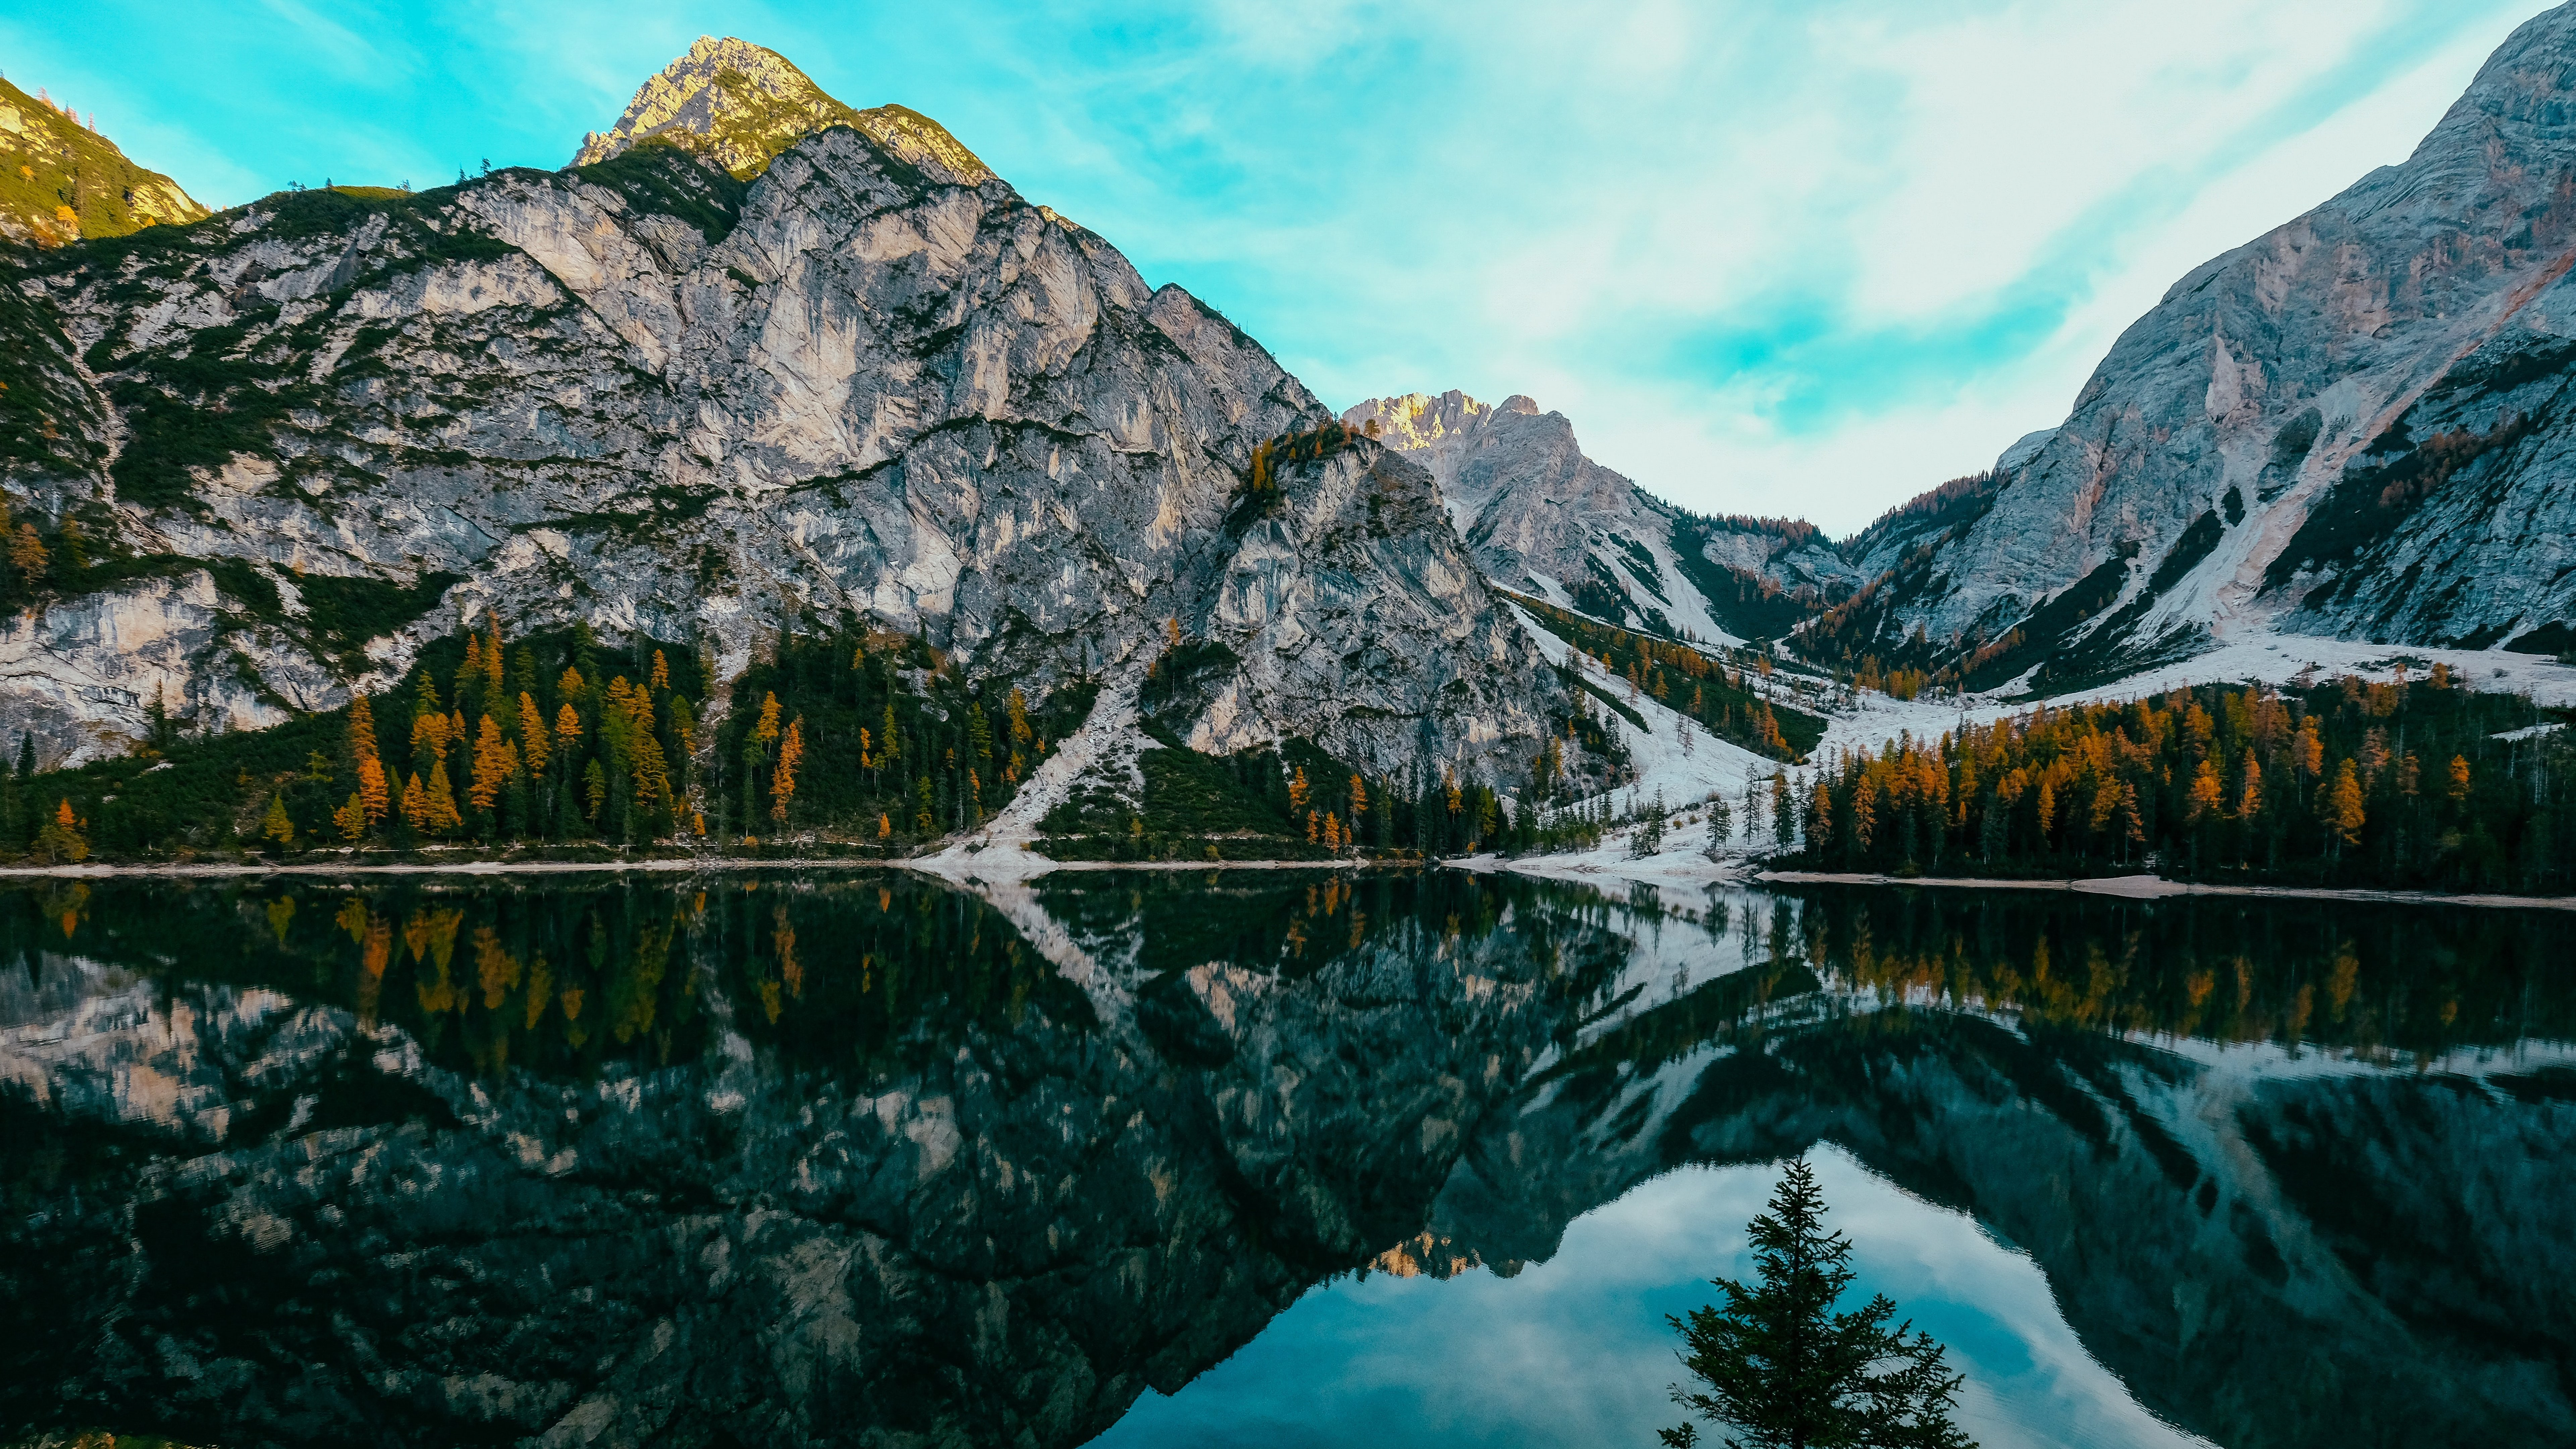 Fondos de pantalla Montañas con reflejo en lago